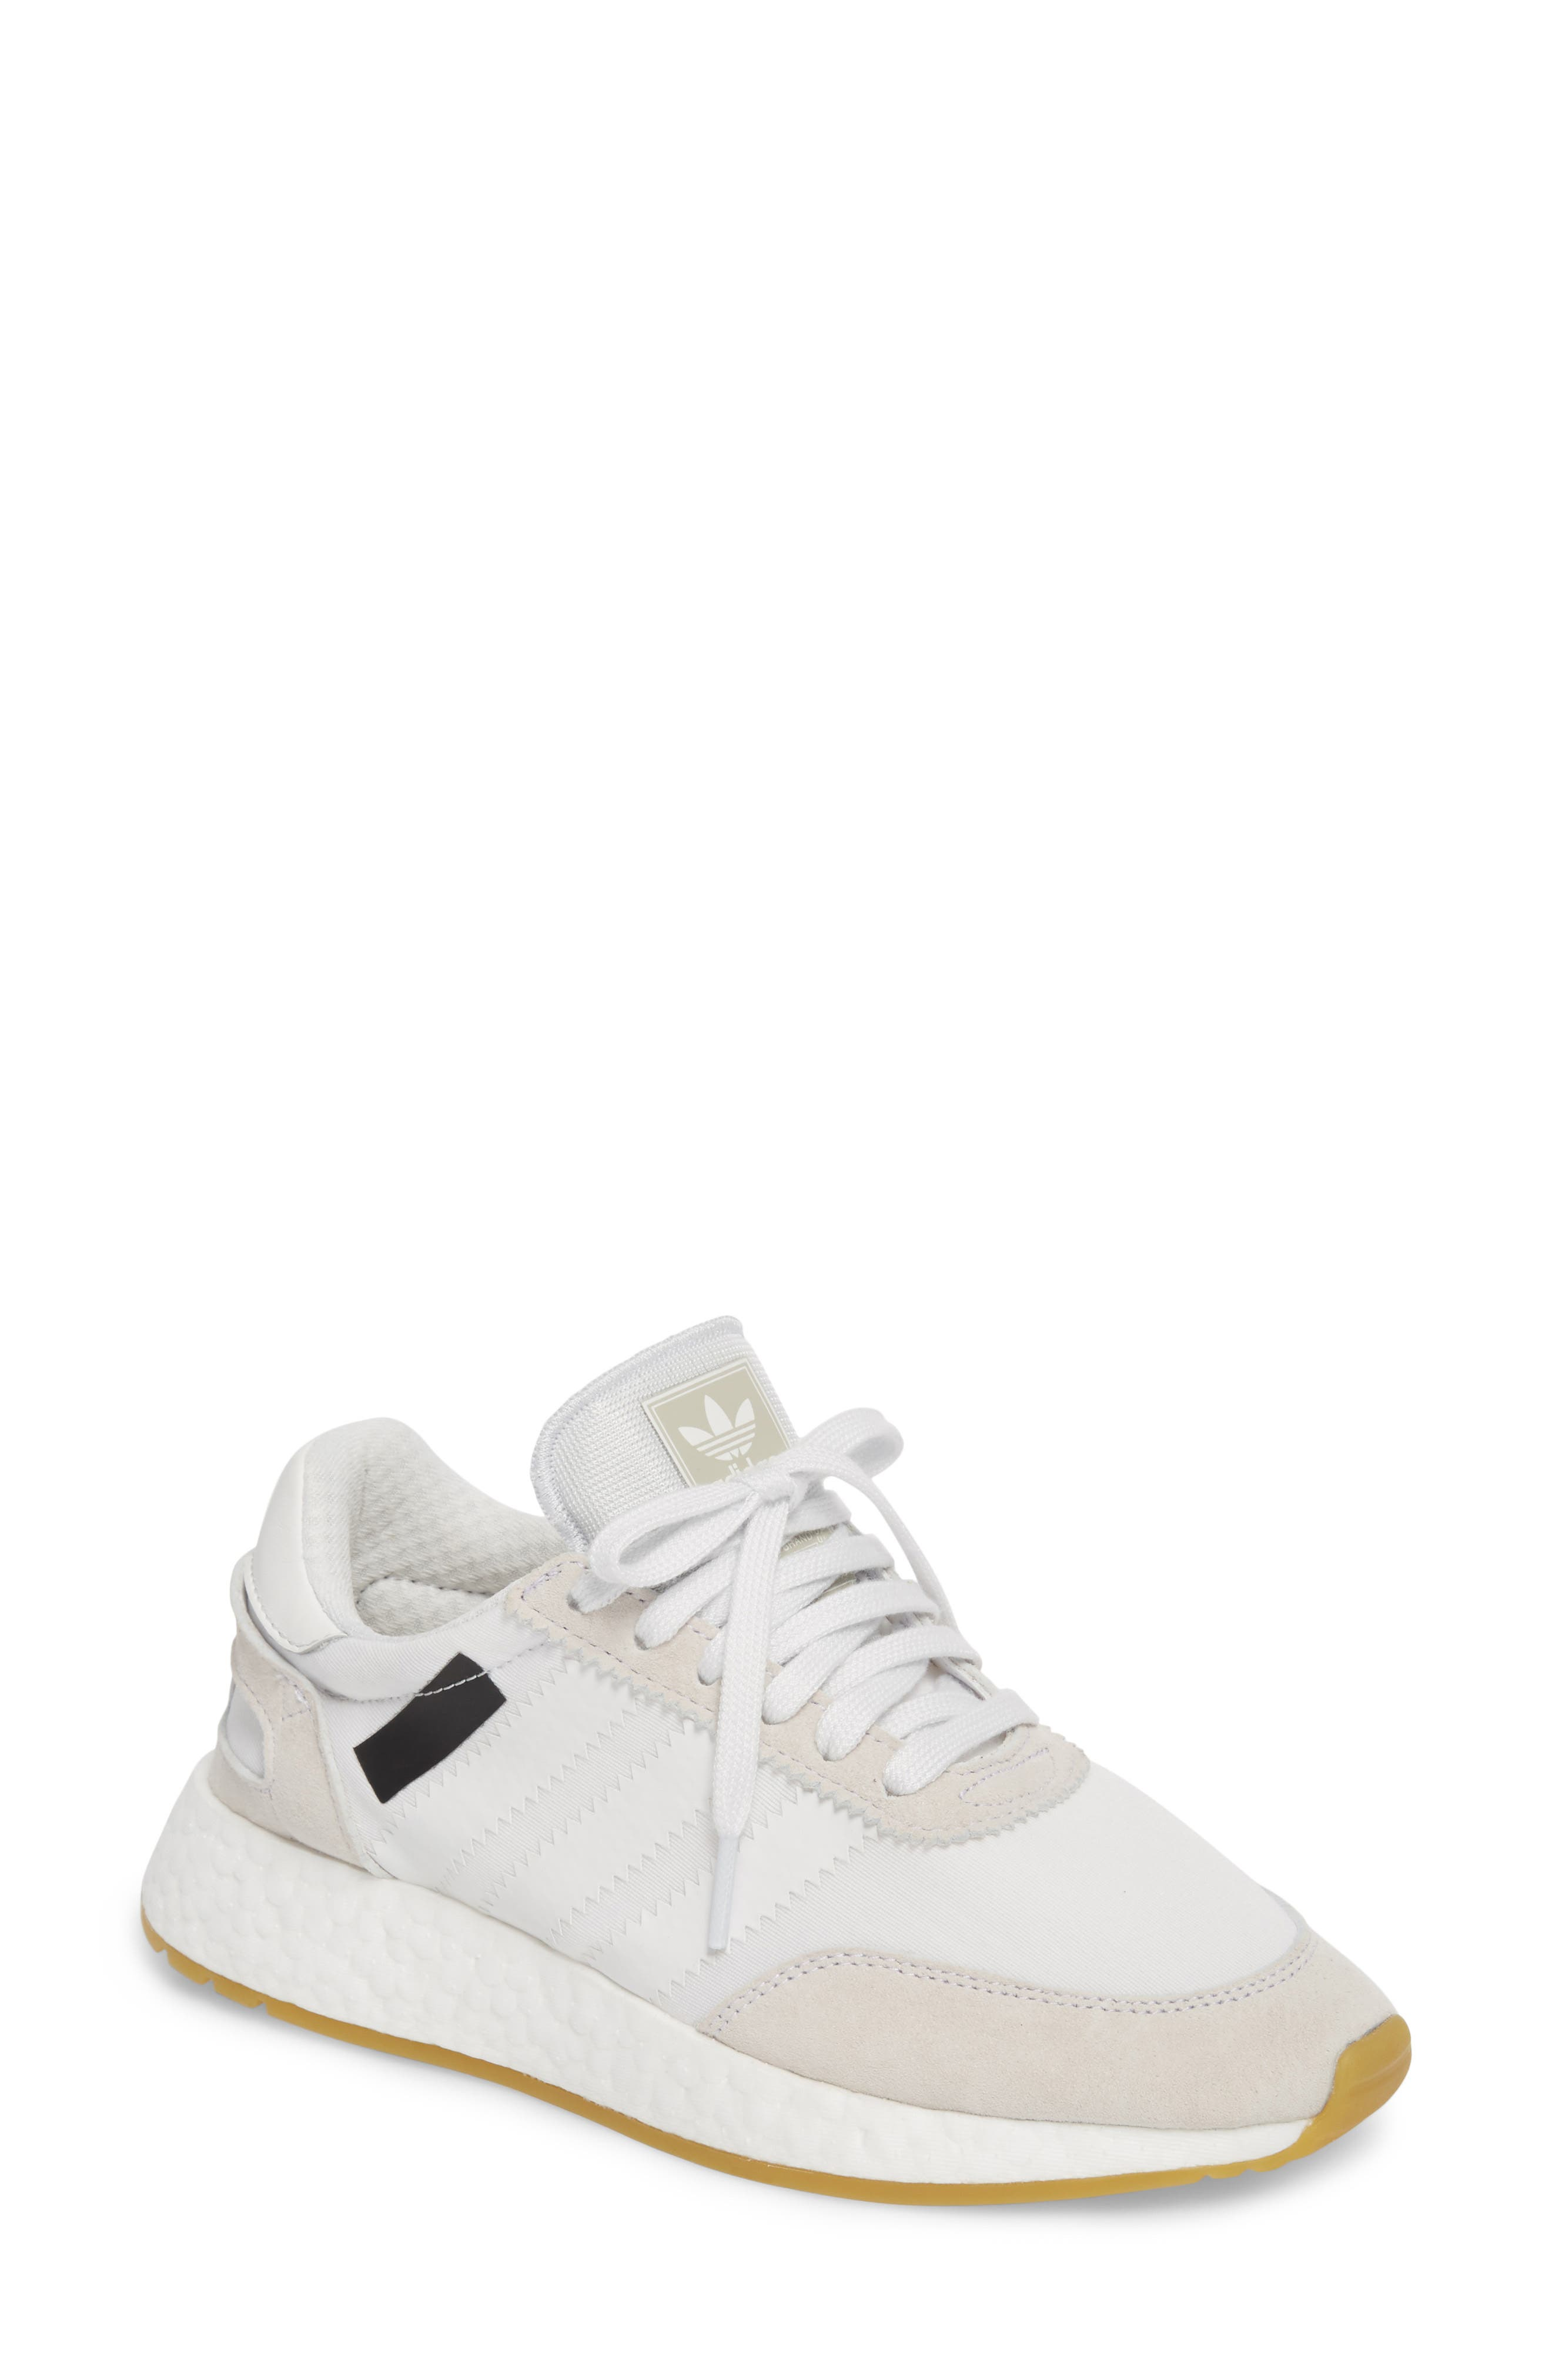 adidas I-5923 Sneaker (Women) | Nordstrom